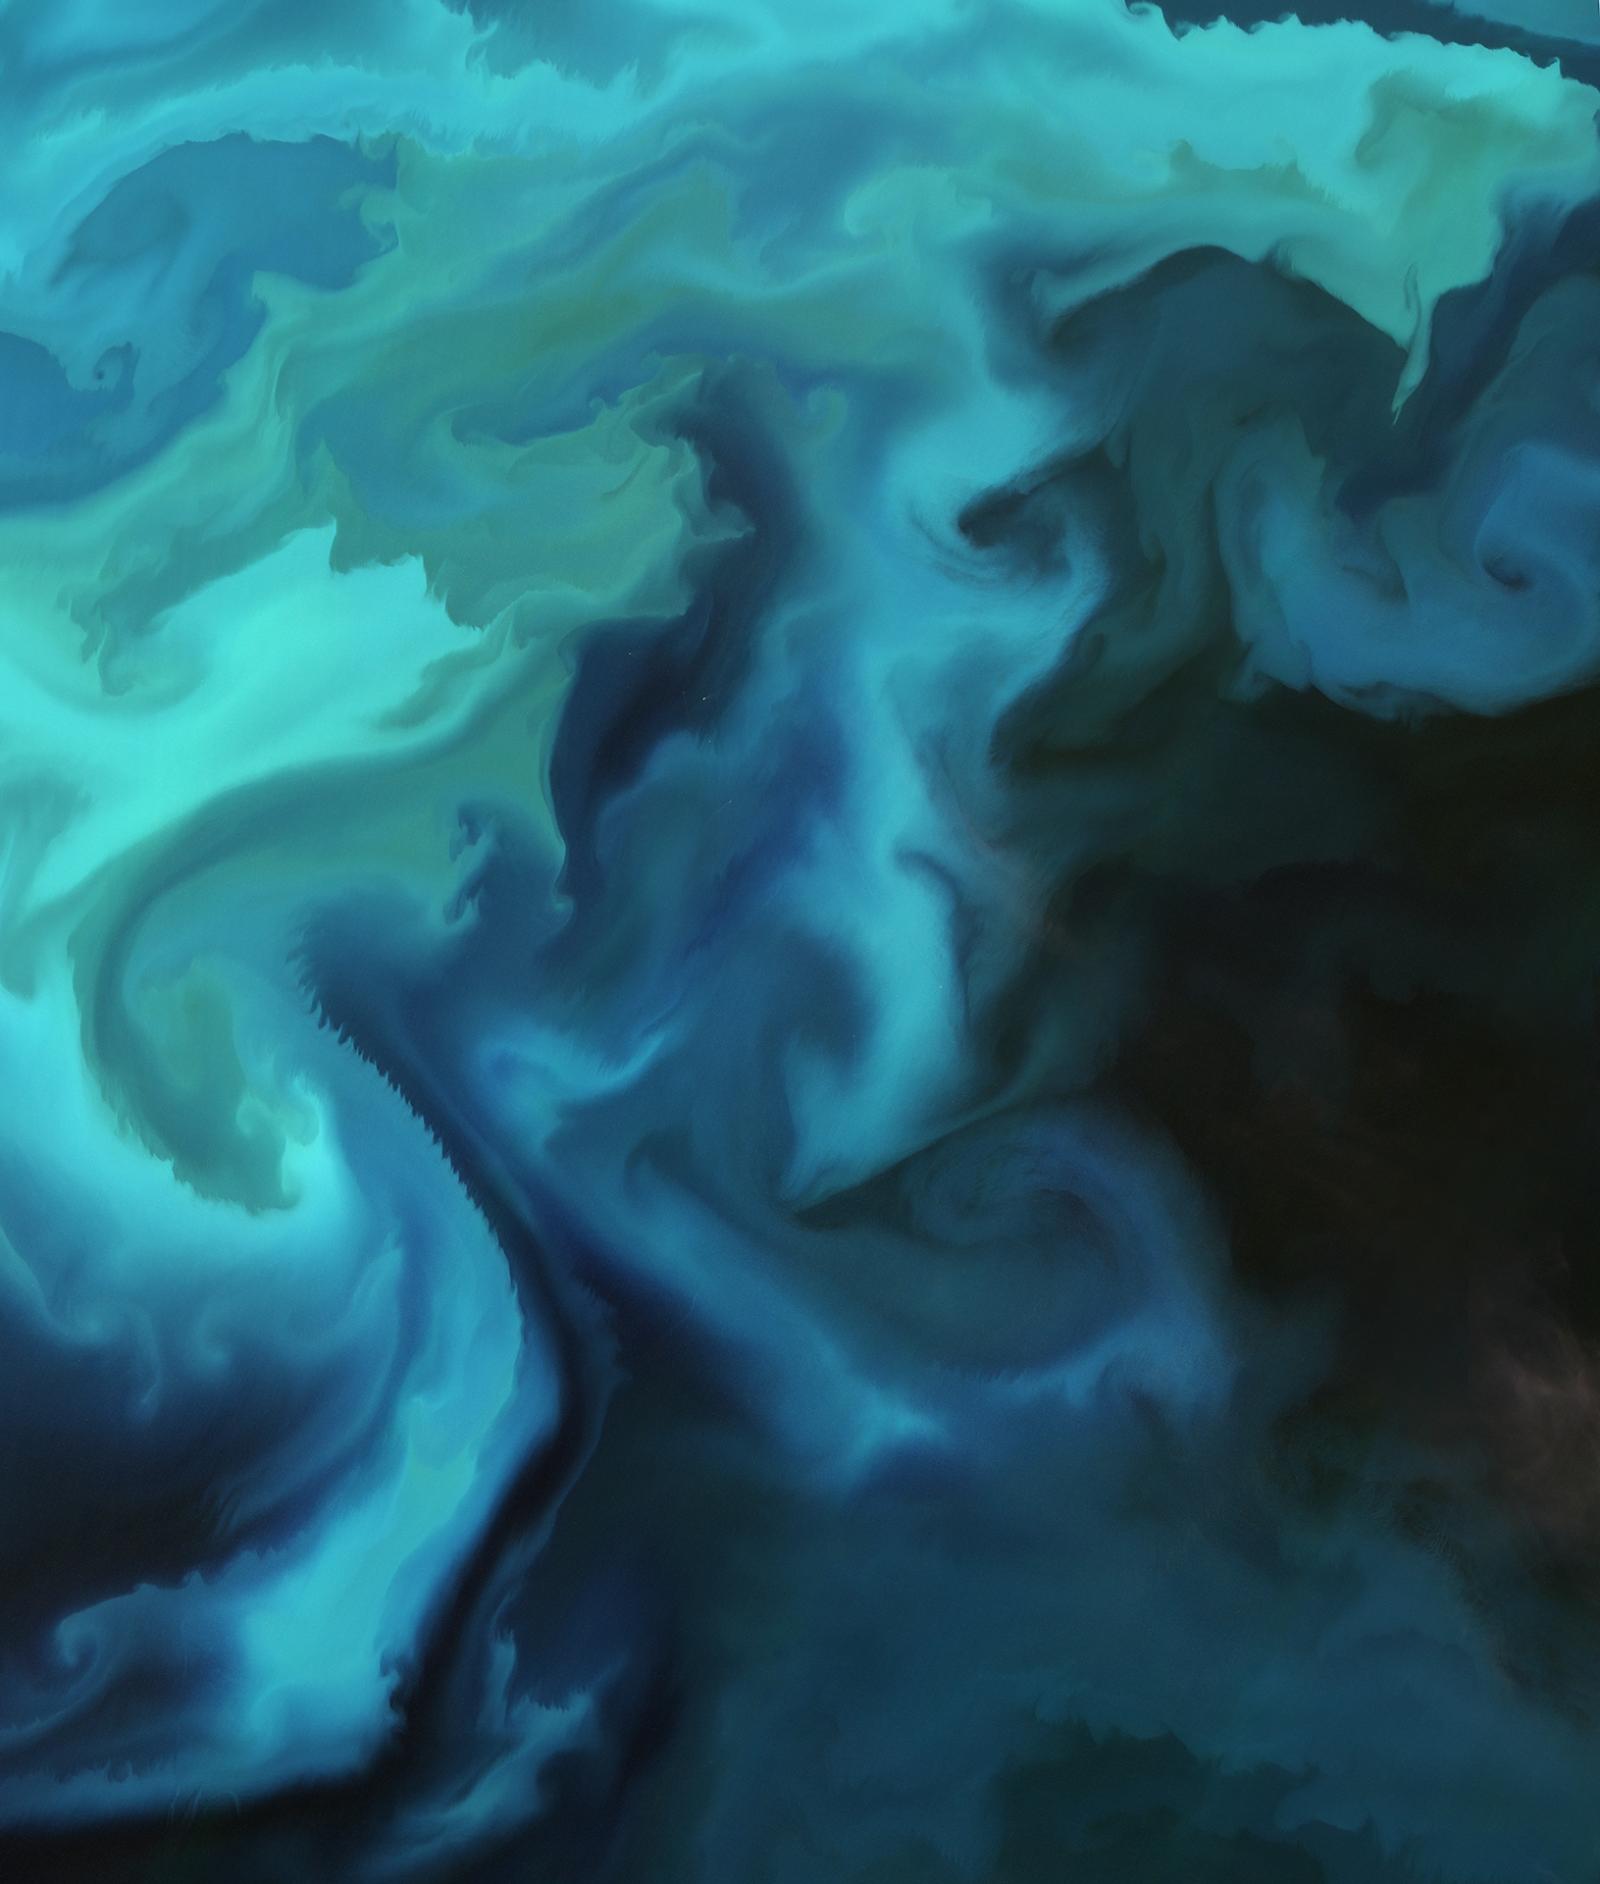 Barents sea plankton bloom